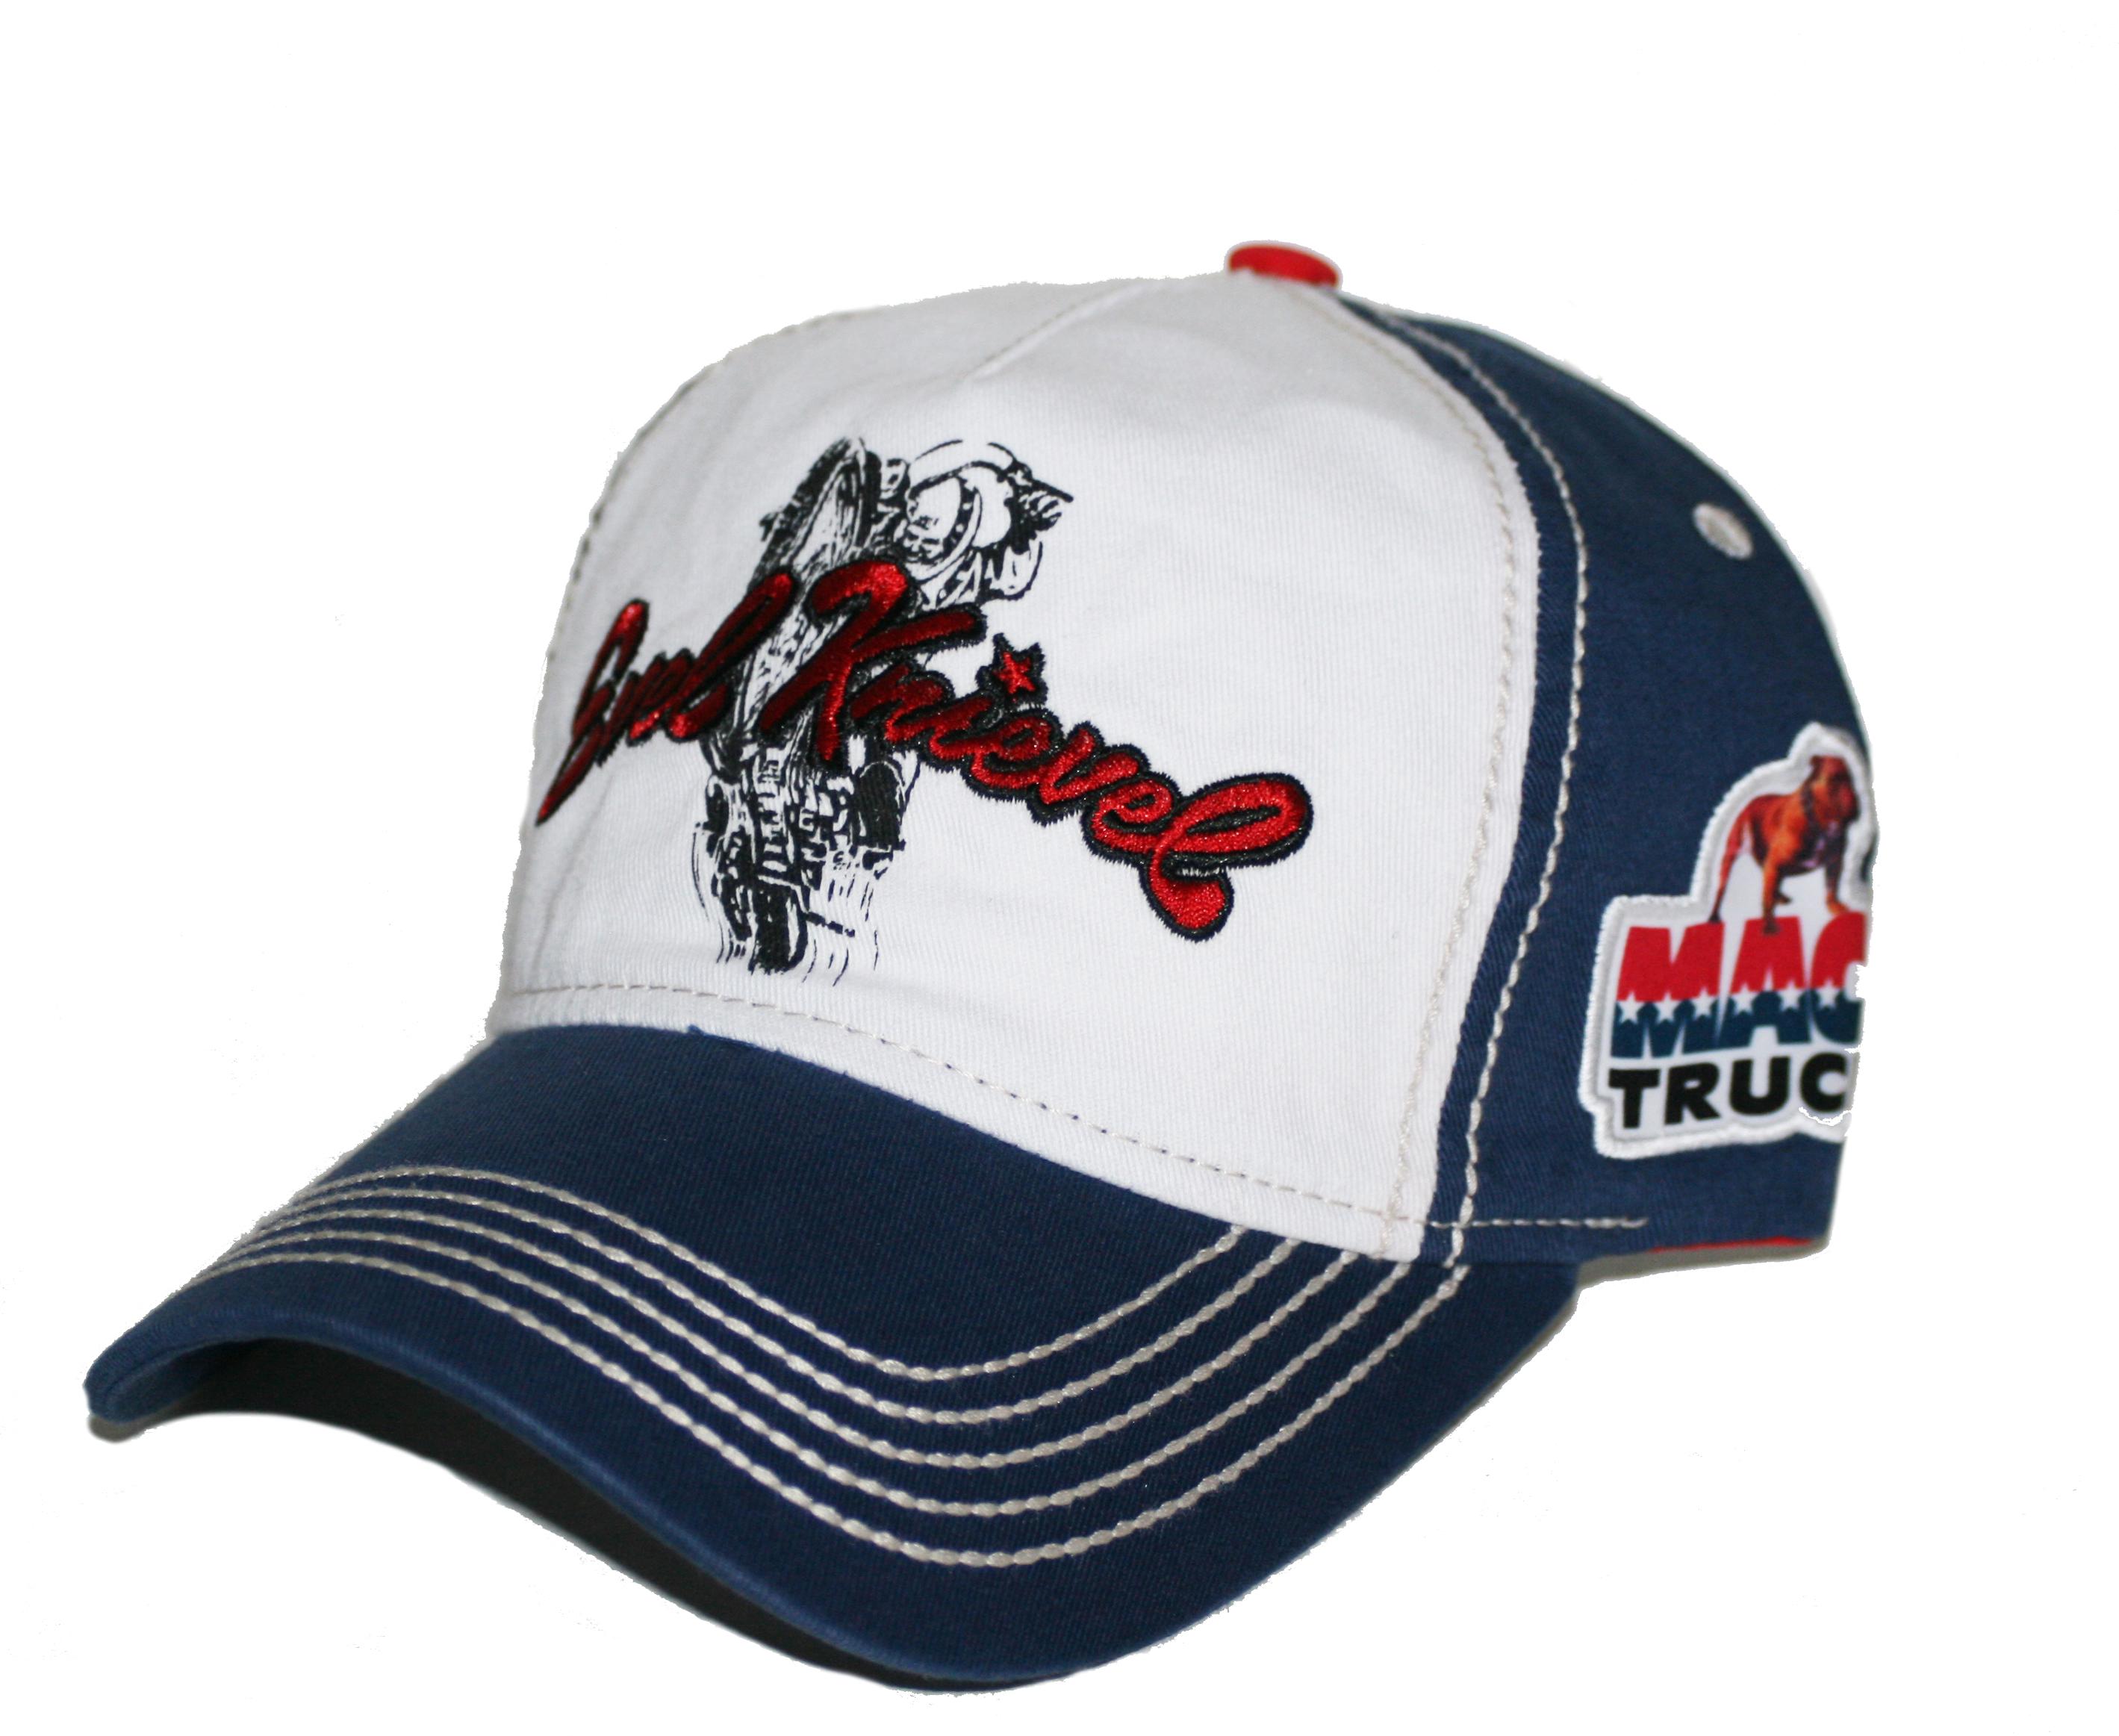 Mack Truck Merchandise - Mack Truck Hats - Mack Trucks Evel Knievel Jump  Cap - Mack Trucks Evel Knievel Jump Caps 78721a62921